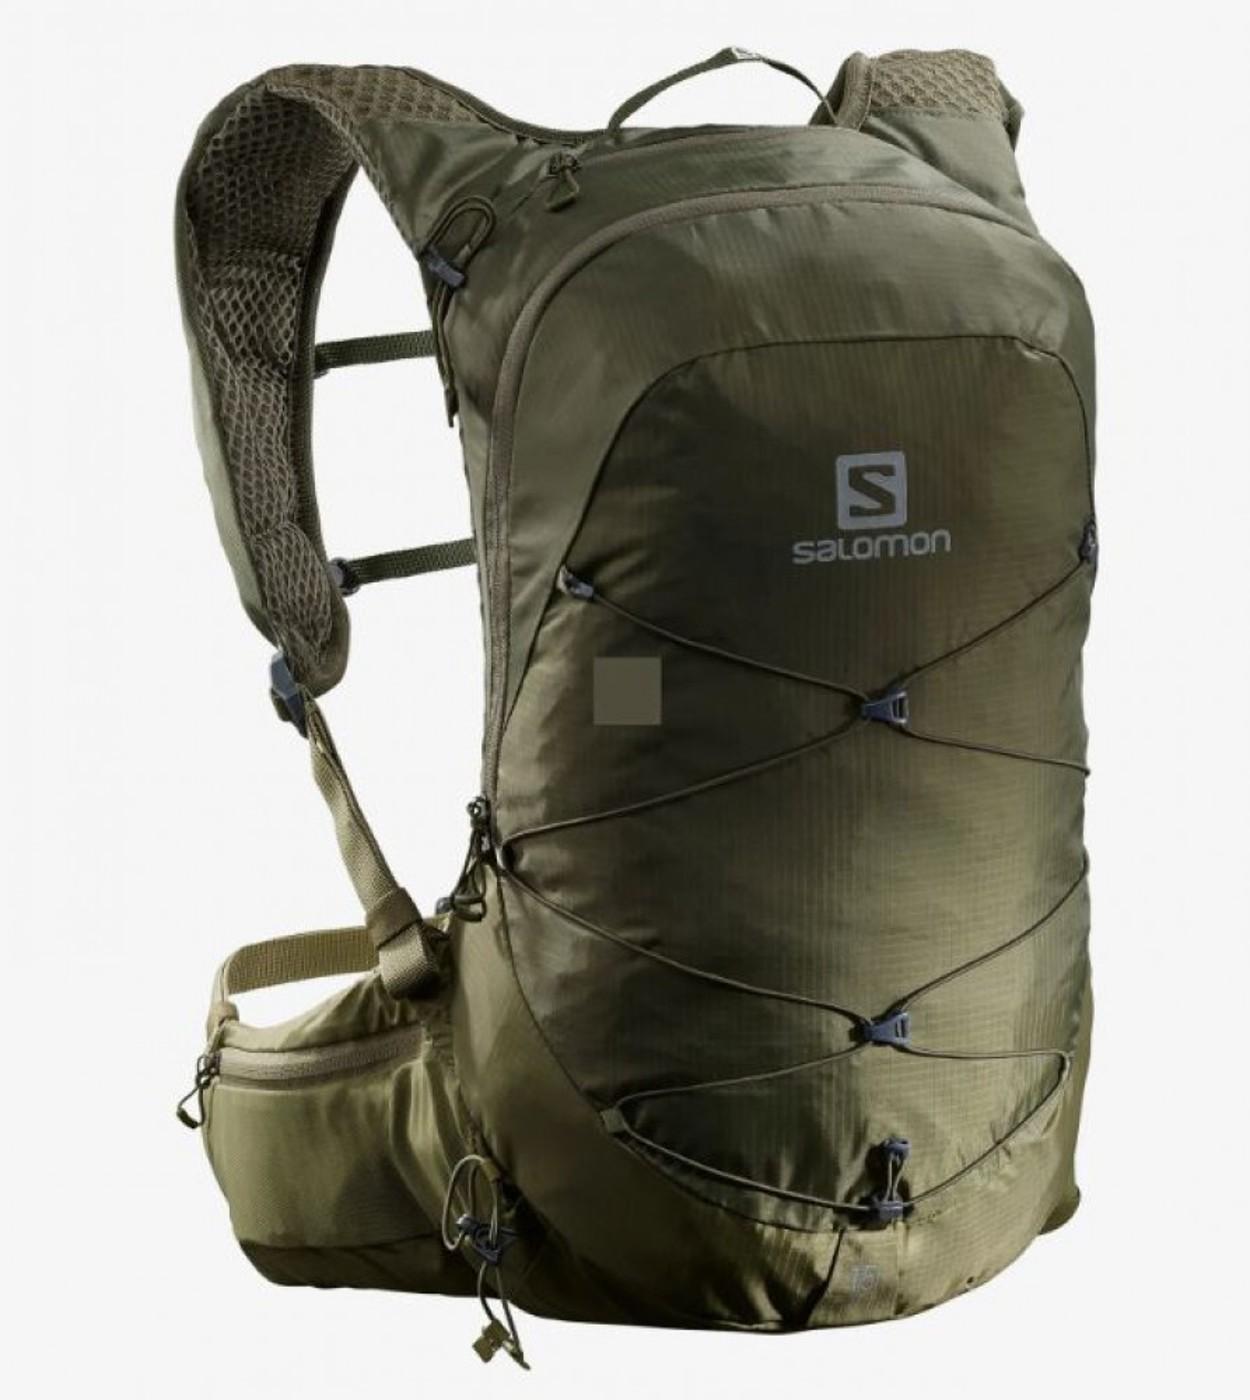 SALOMON XT 15 Unisex - Hiking-Tasche